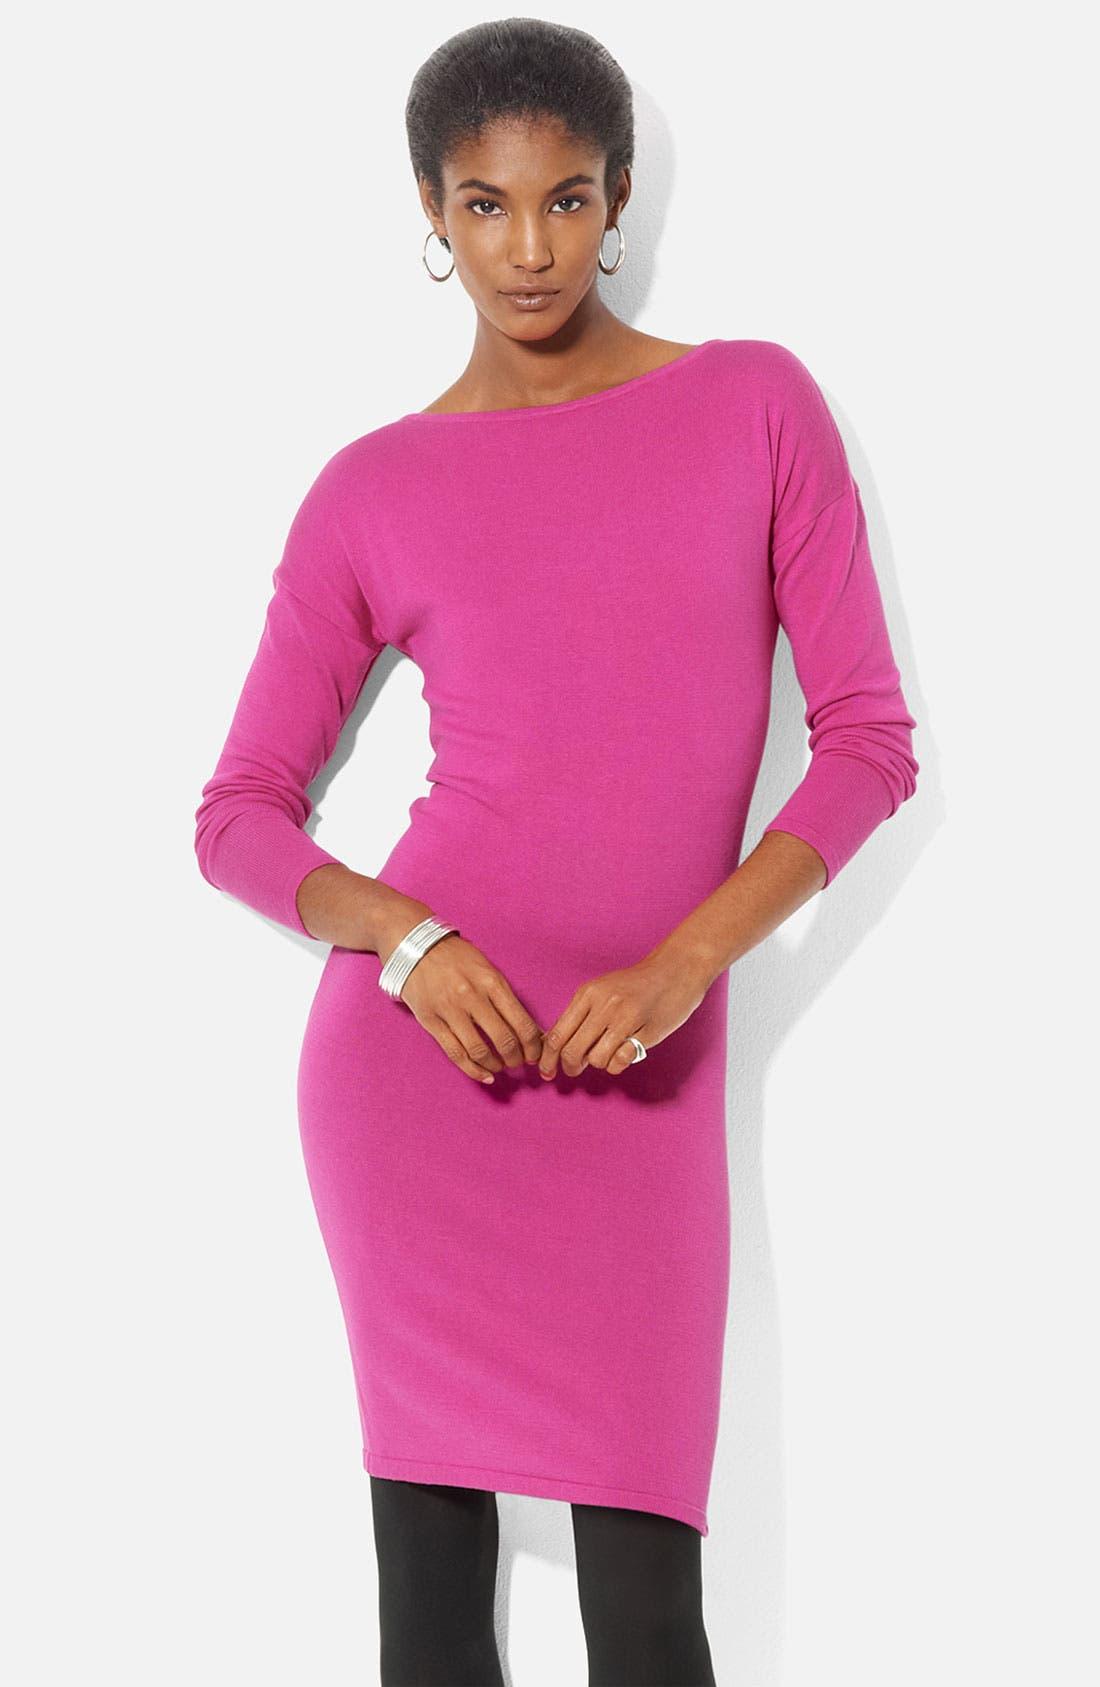 Alternate Image 1 Selected - Lauren Ralph Lauren Bateau Neck Merino Knit Dress (Petite)